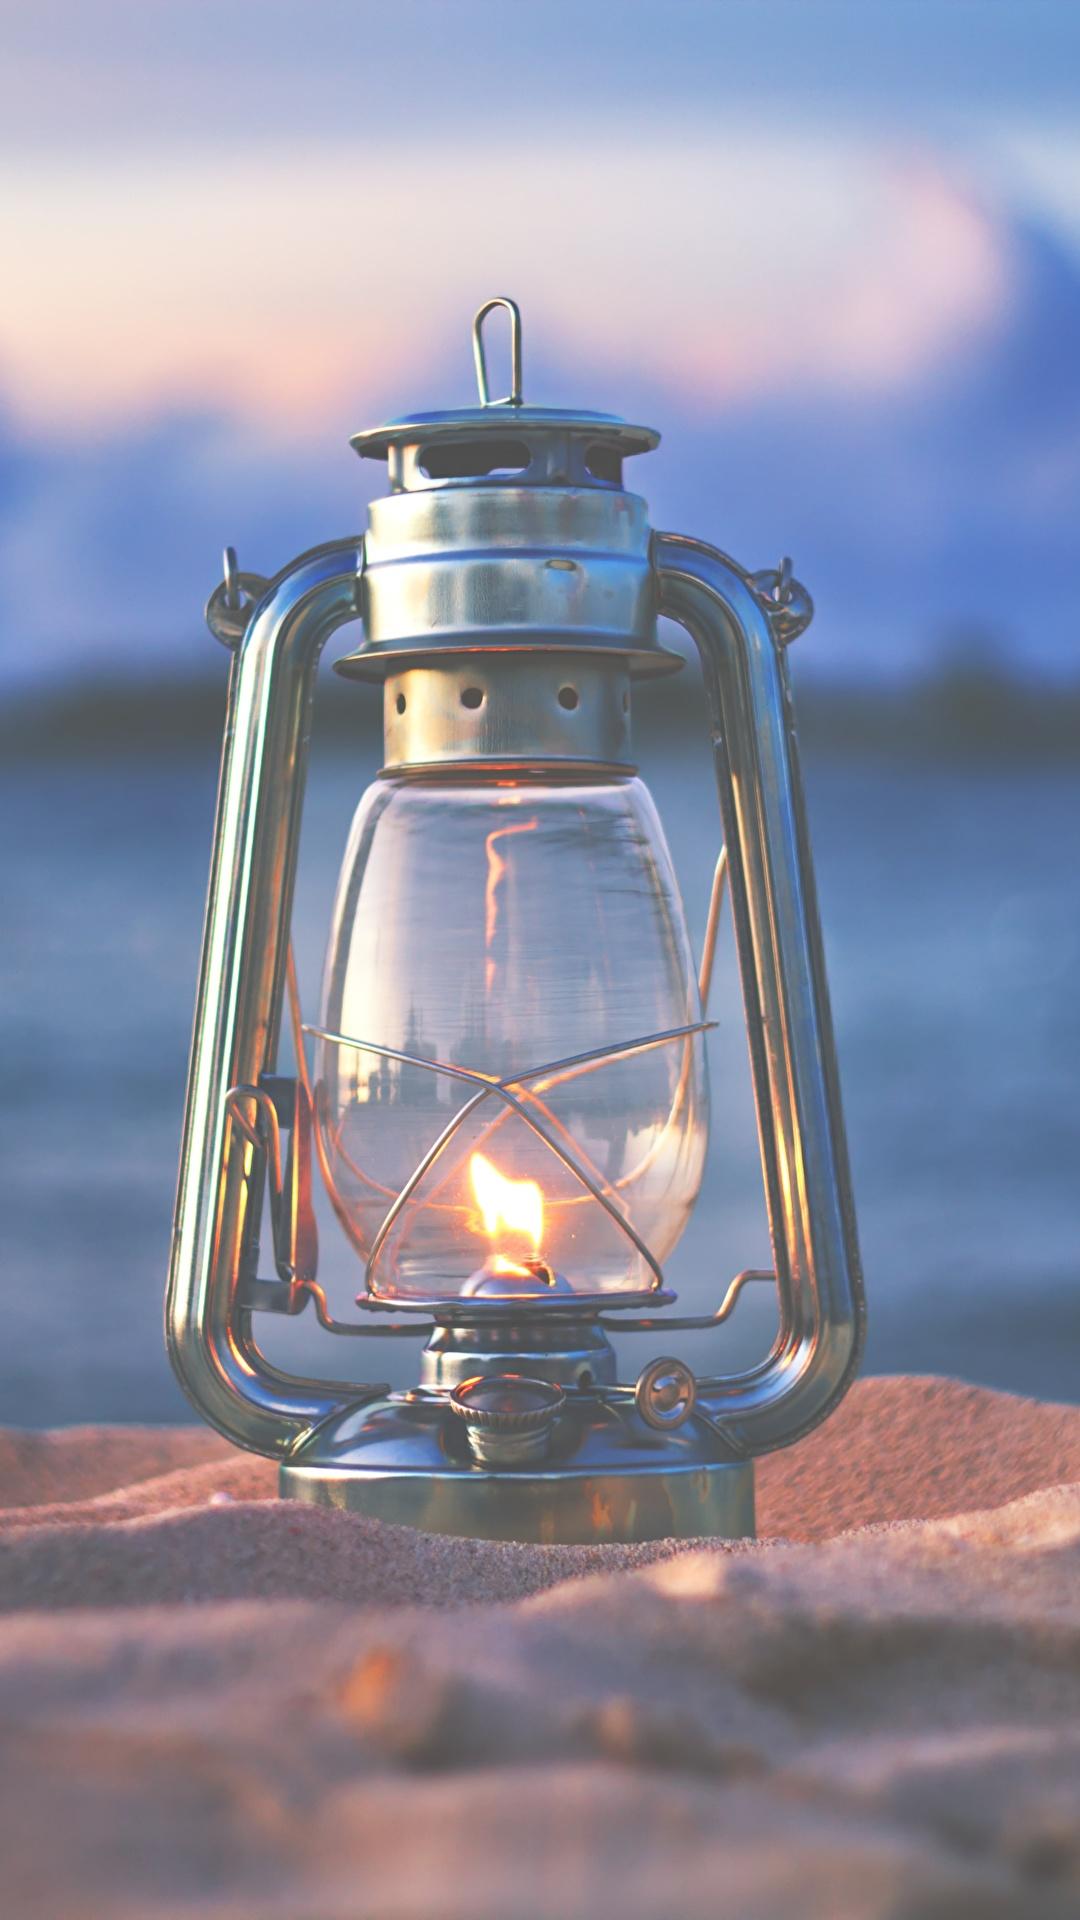 Desktop Hintergrundbilder Bokeh Petroleumlampe Sand Feuer Großansicht 1080x1920 für Handy unscharfer Hintergrund Flamme hautnah Nahaufnahme